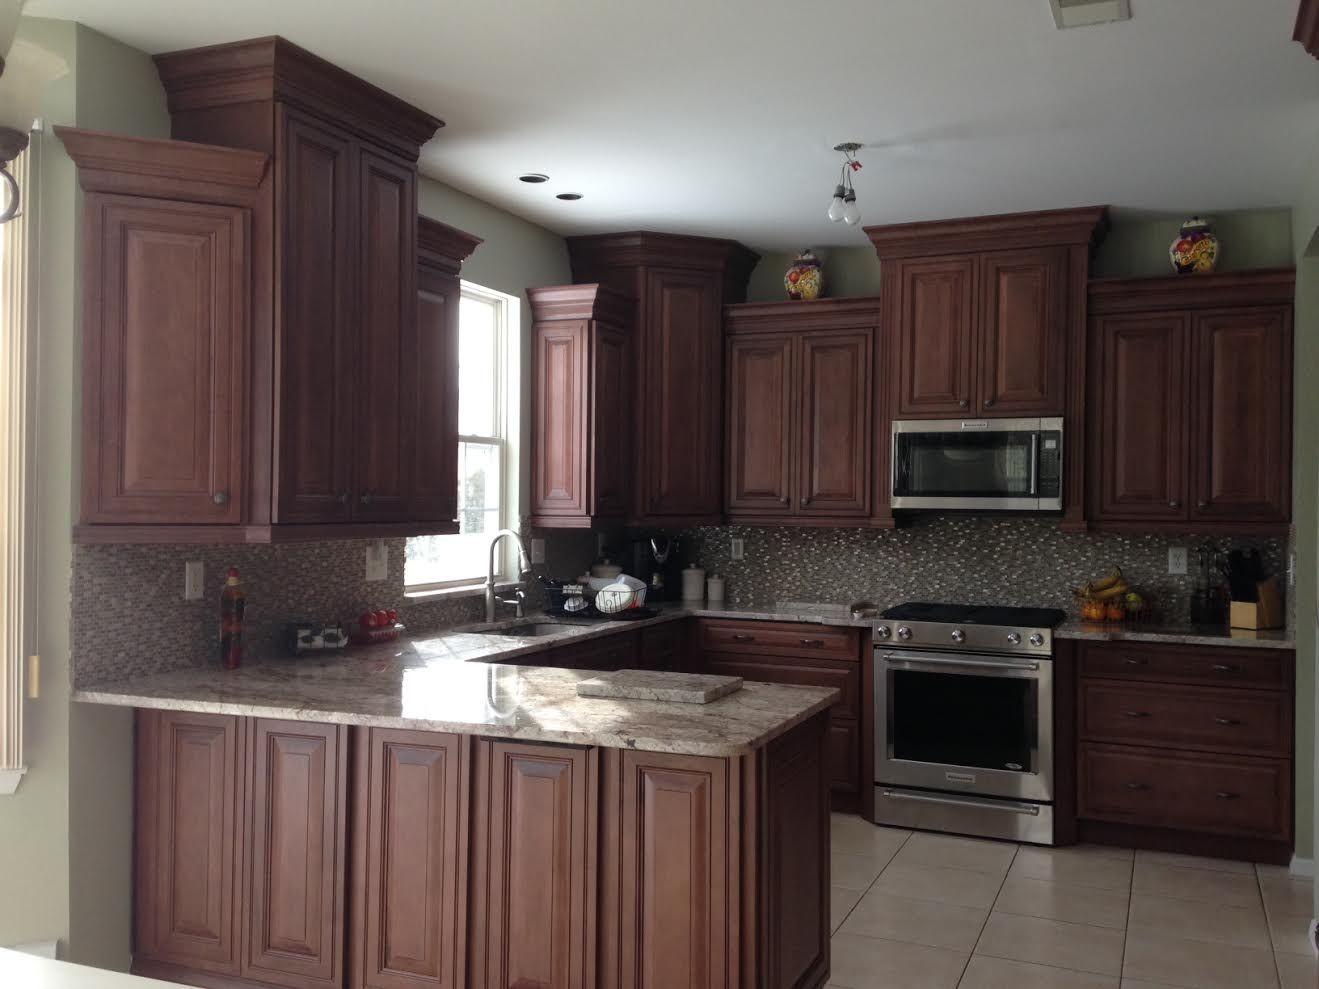 Decora Cinnabar In The Whillshire Door Kitchen Cabinets Prices Buy Kitchen Cabinets Used Kitchen Cabinets